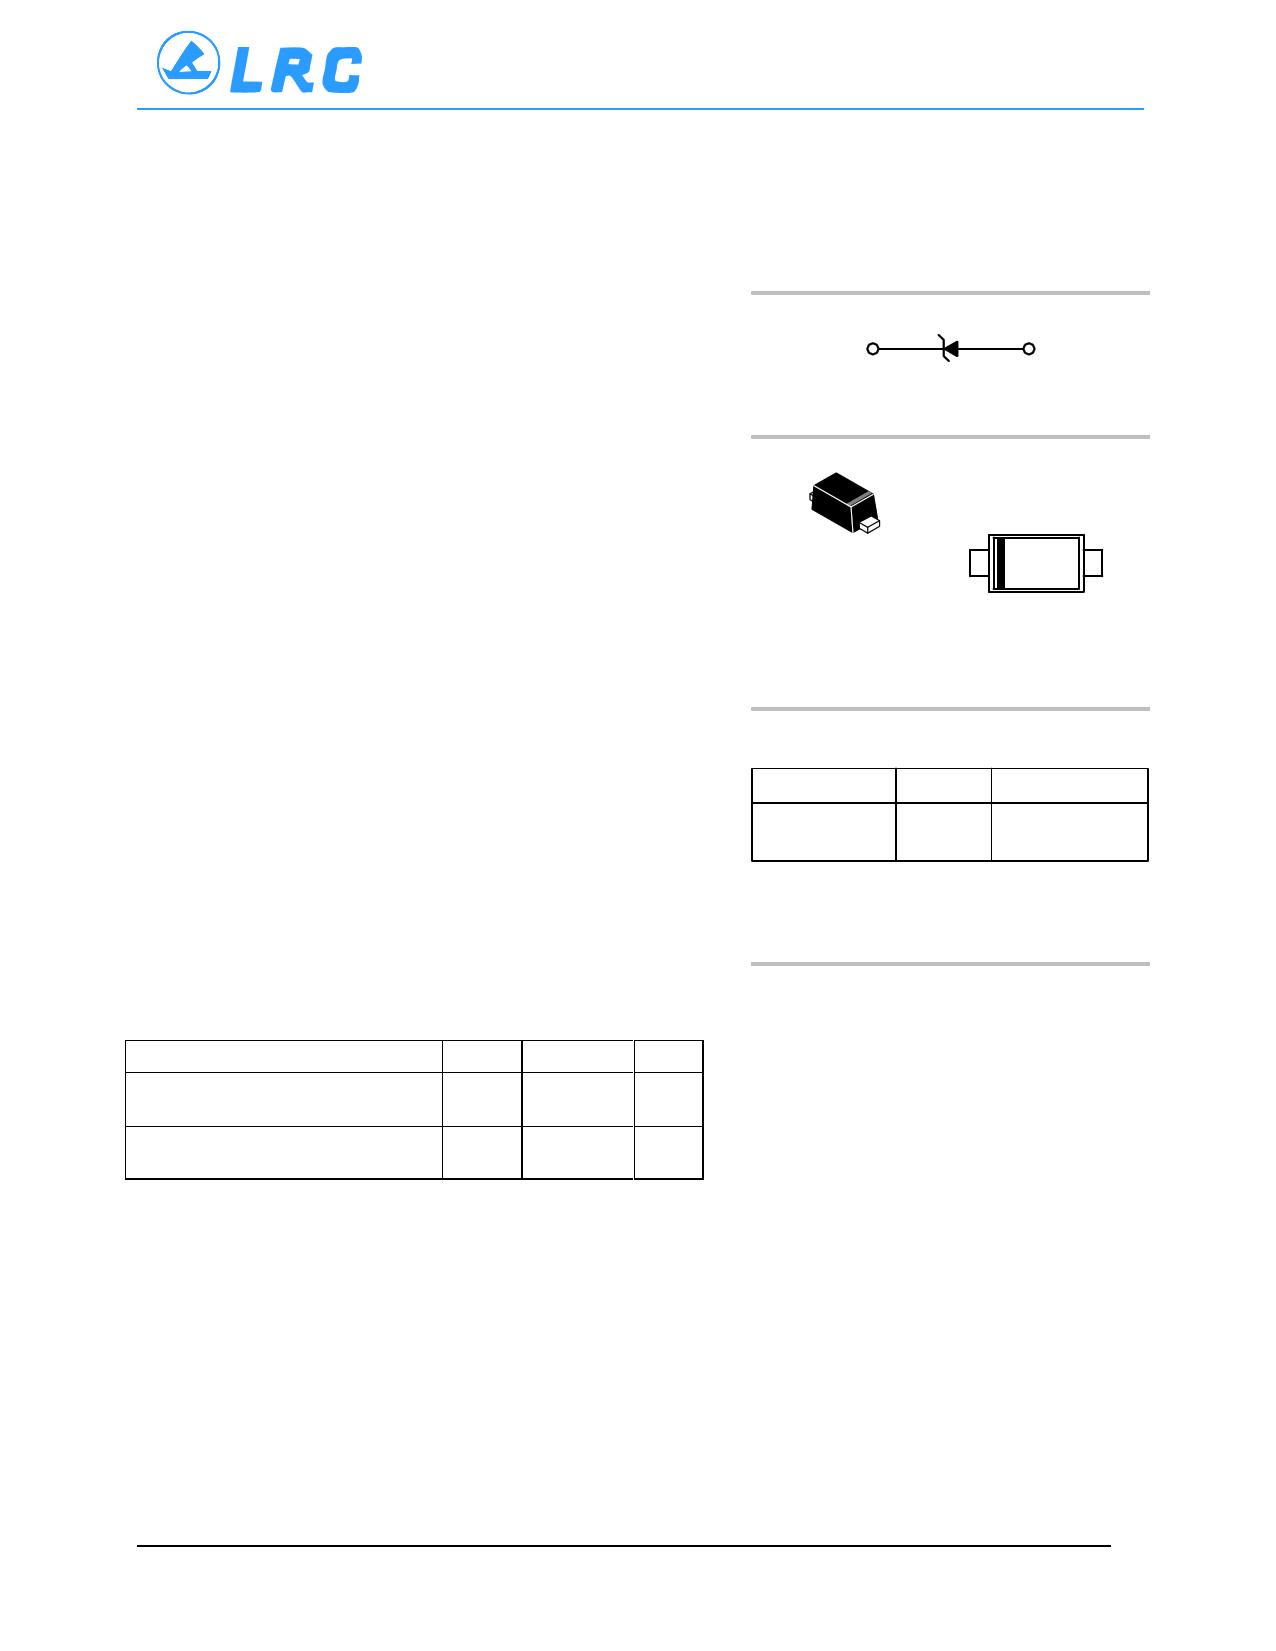 LNZ9F4V3T5G datasheet, circuit